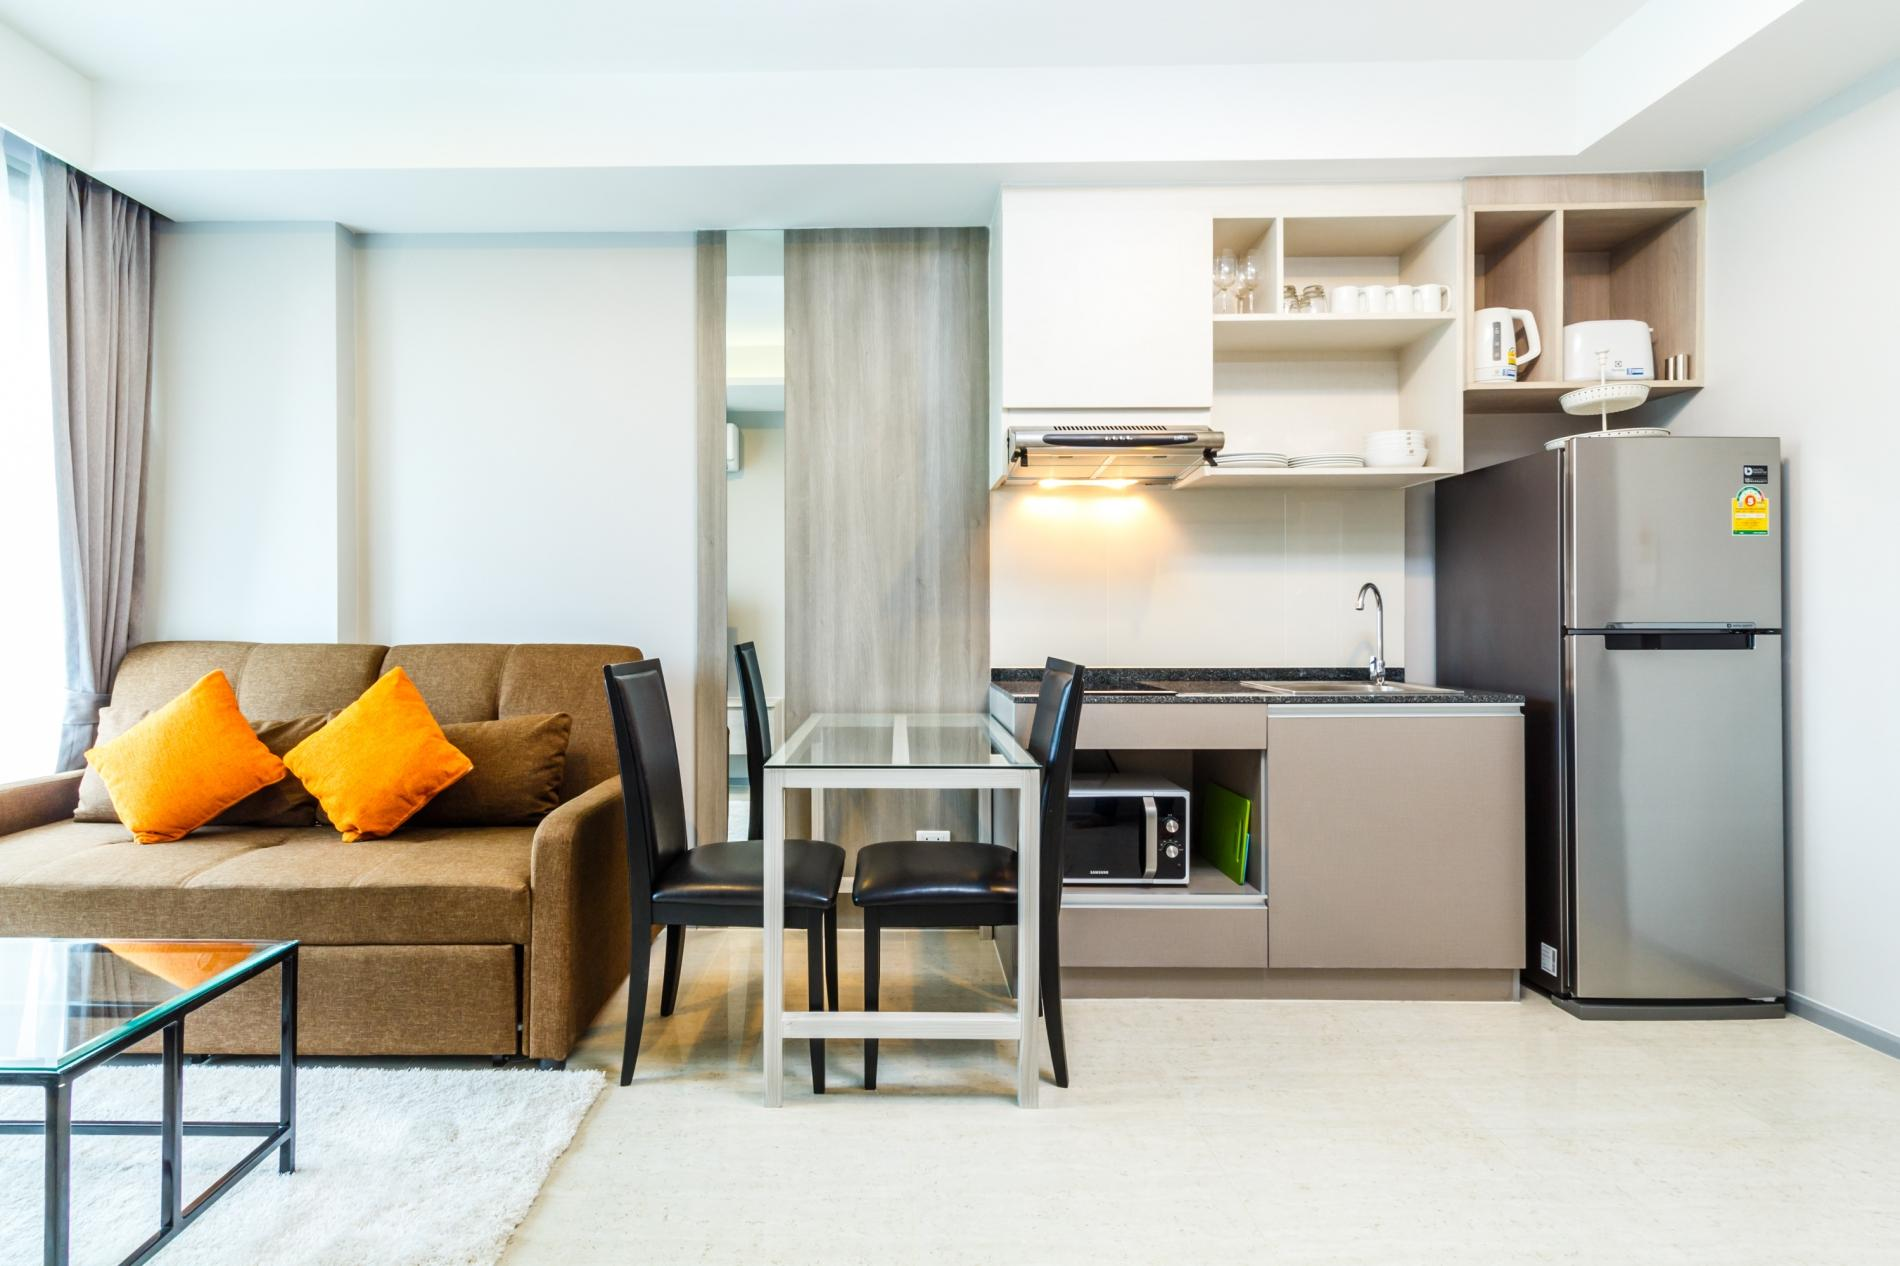 Apartment 6Av 703 - Large apartment in Surin beach photo 20256726